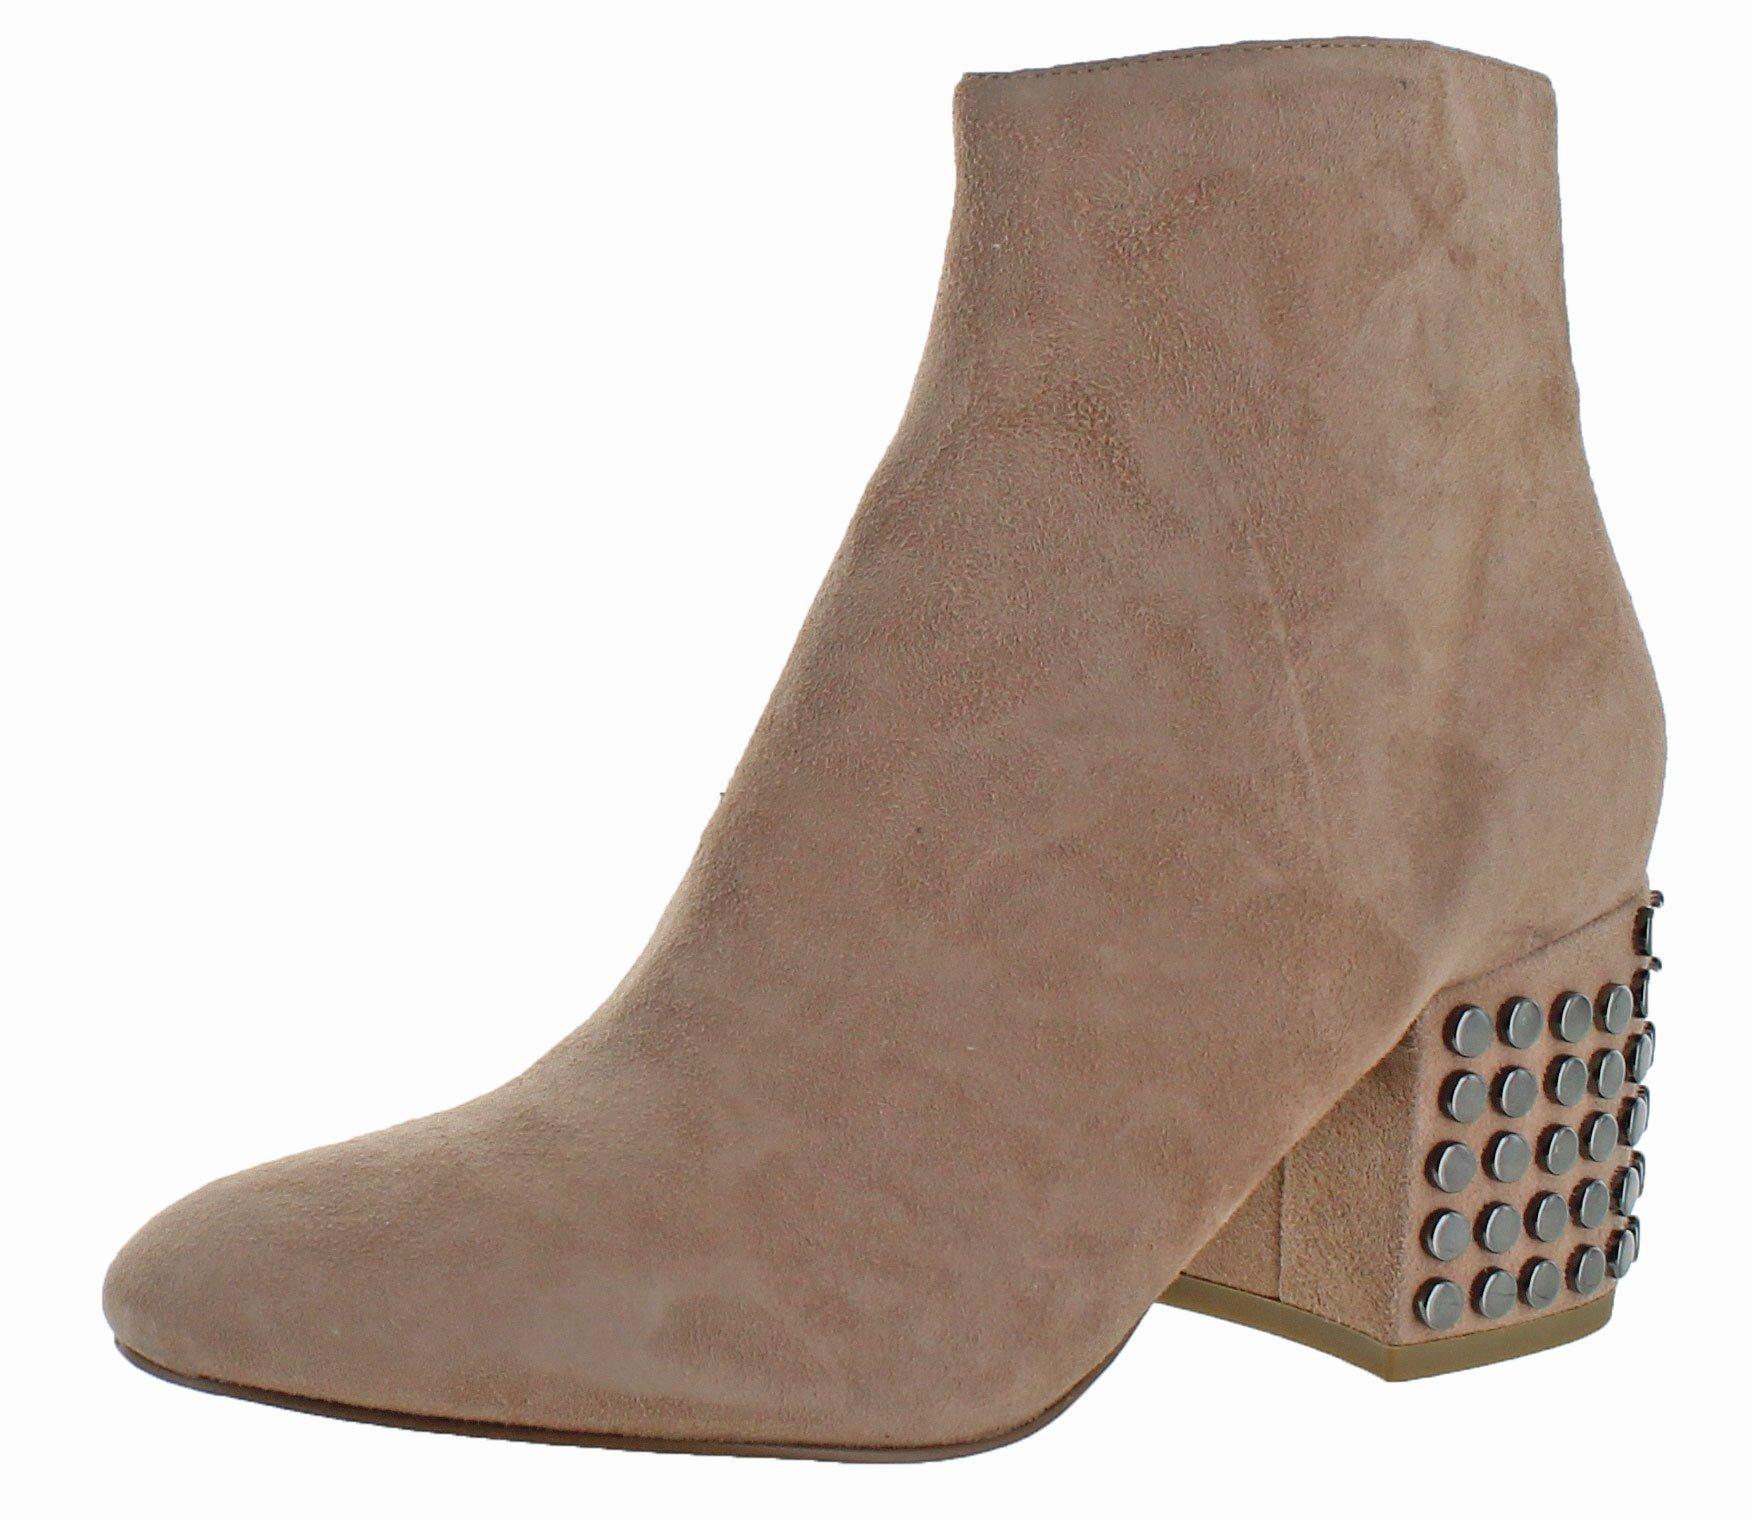 KENDALL + KYLIE Women's Blythe Ankle Boot, Blush, 9 Medium US